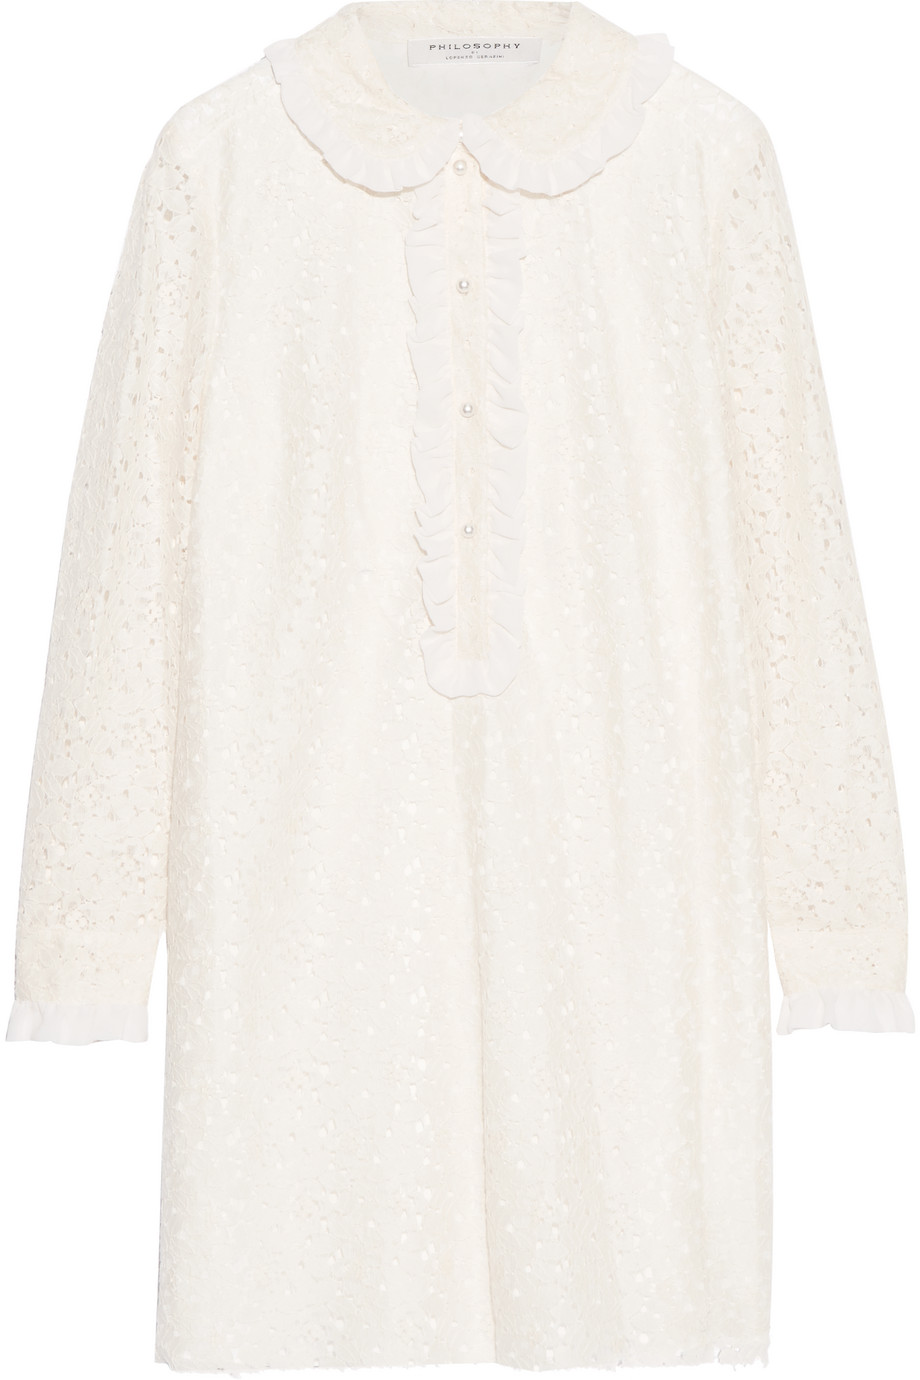 Ruffled Chiffon-Trimmed Corded Lace Mini Dress, Cream, Women's, Size: 42